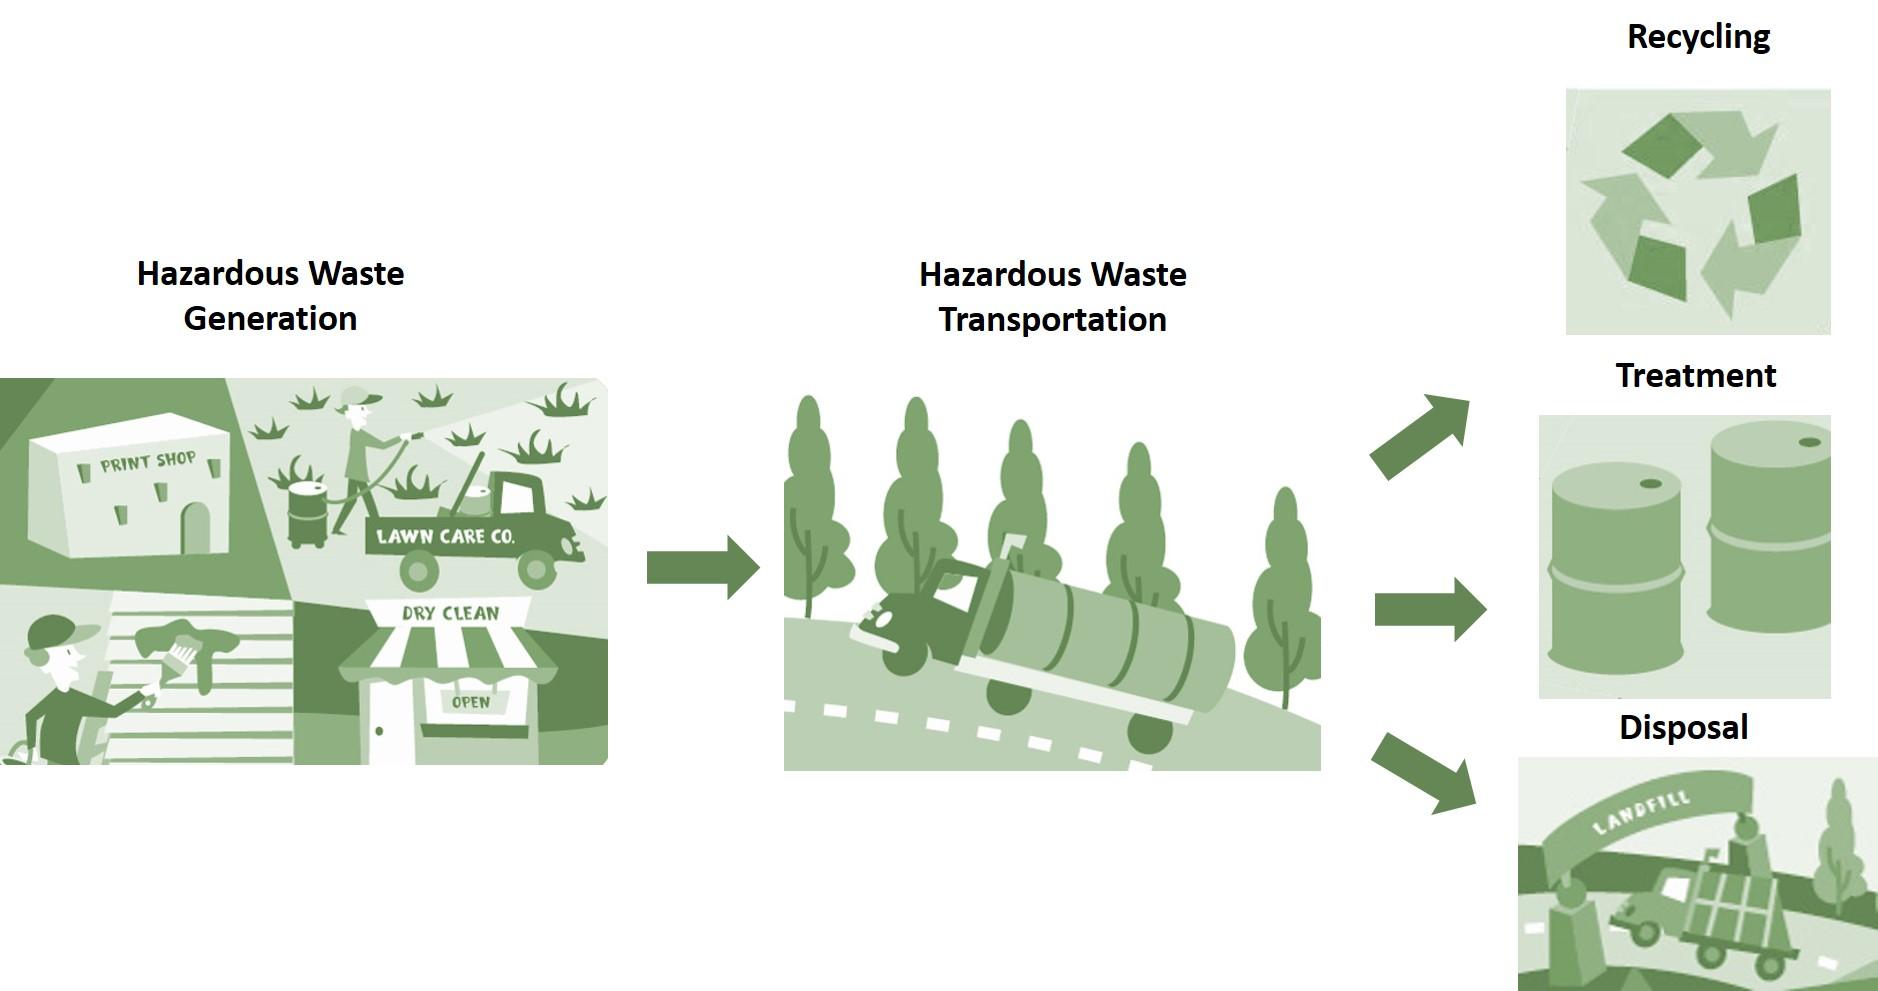 The Proper Management of Hazardous Waste